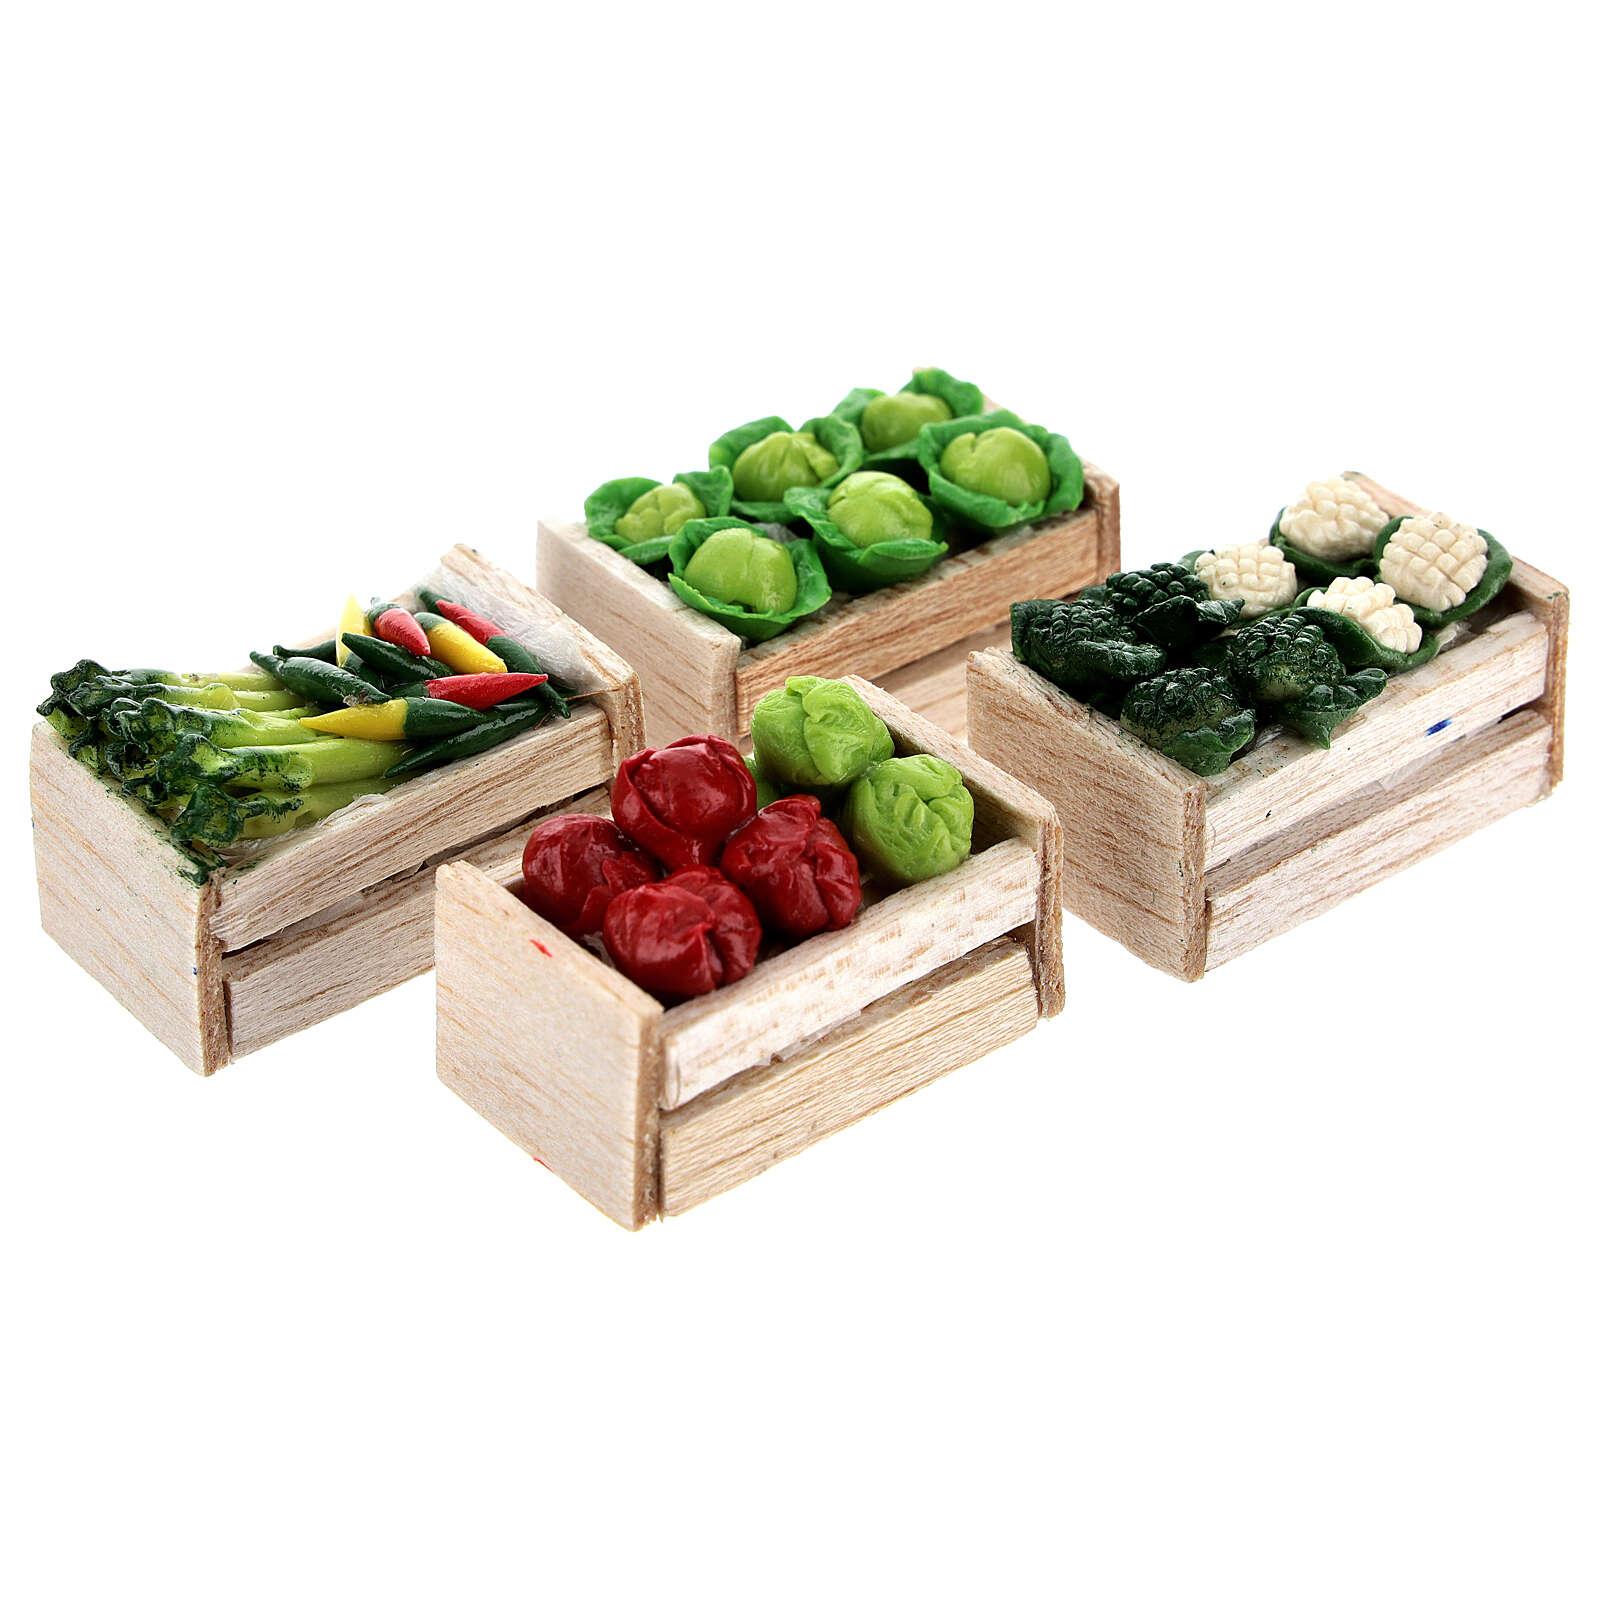 Cassette verdura e ortaggi 12 pz 2x2,5x2 cm presepi 8 cm 4